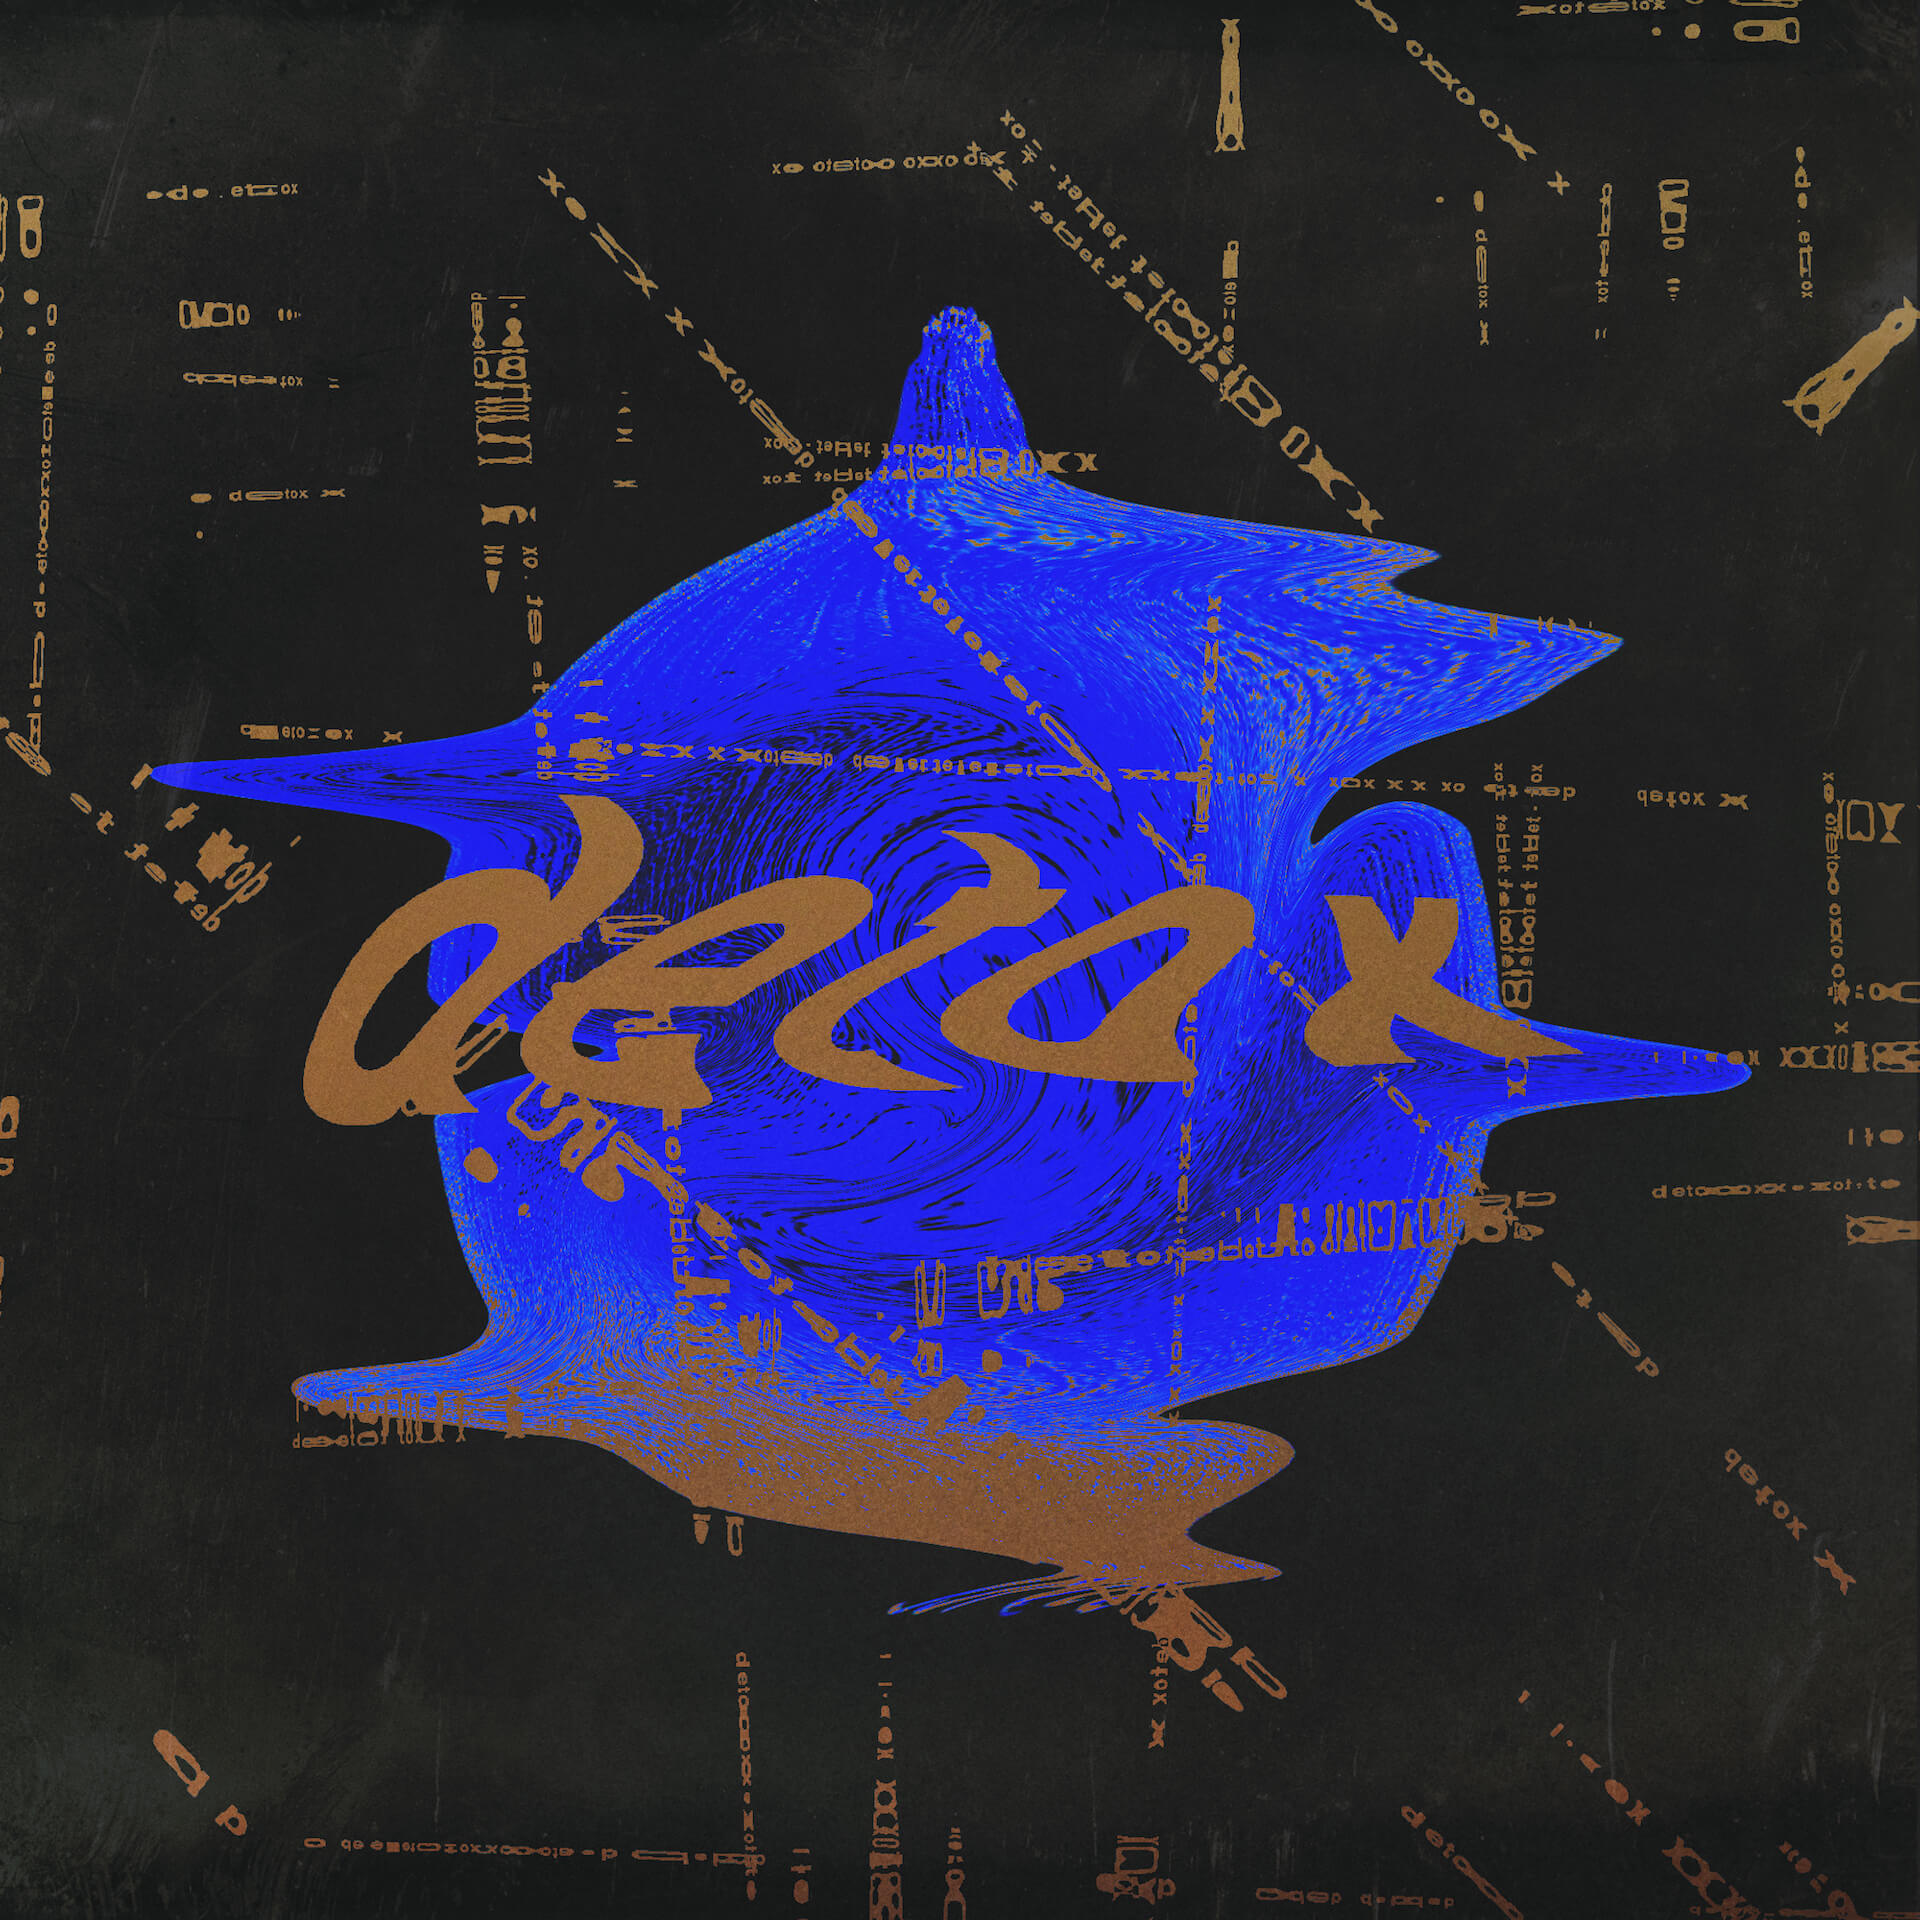 〈OMAKE CLUB〉所属のchop the onion、「NEO SOLE feat. 脇田もなり & BAOBAB MC(JBFC)」のMVを公開|新アルバム『detox』も発表 music200130_choptheonion_1